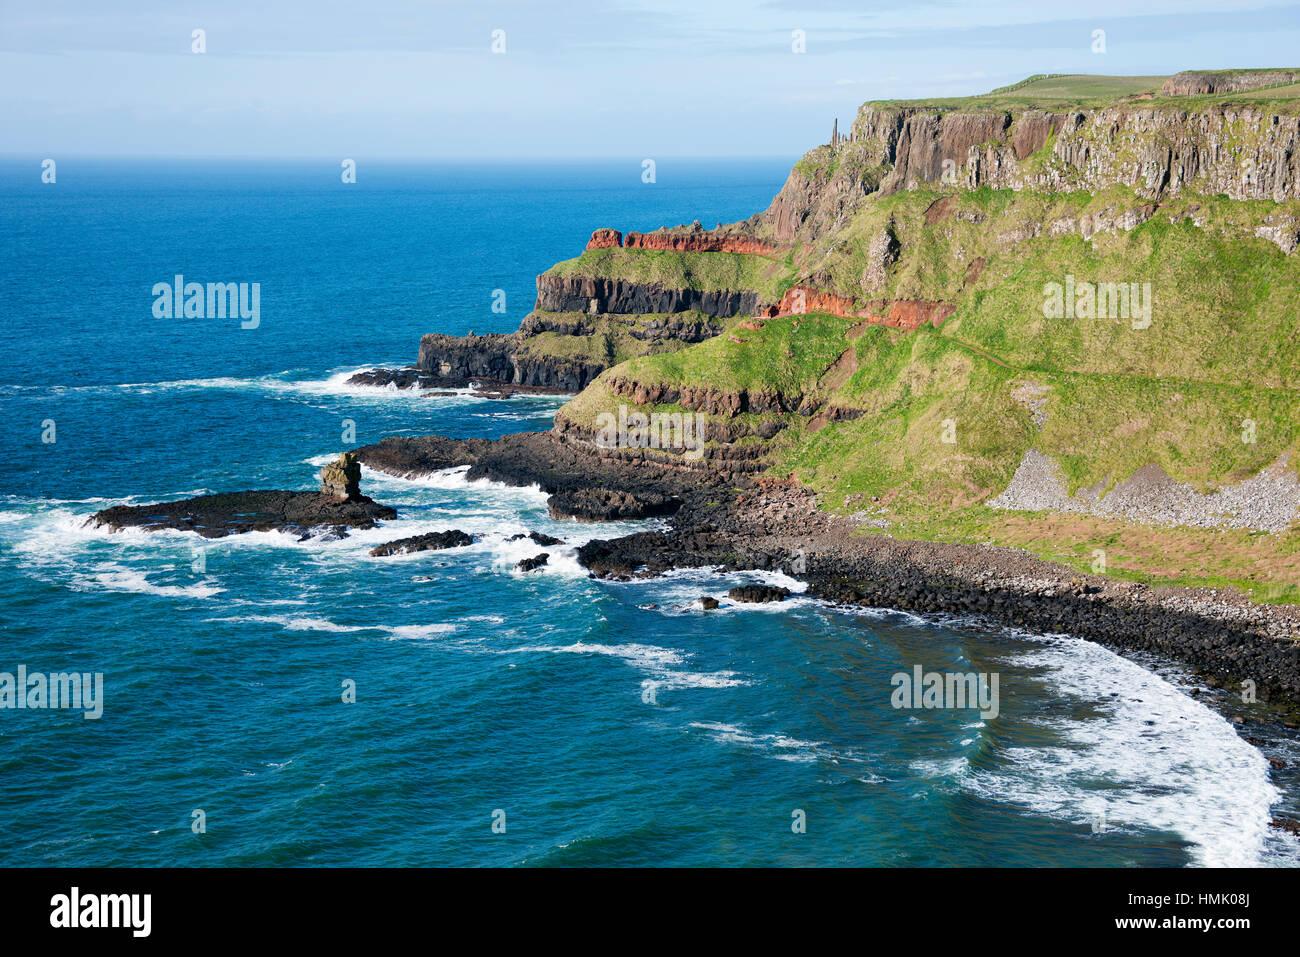 Giants Causeway, County Antrim, Northern Ireland, United Kingdom - Stock Image